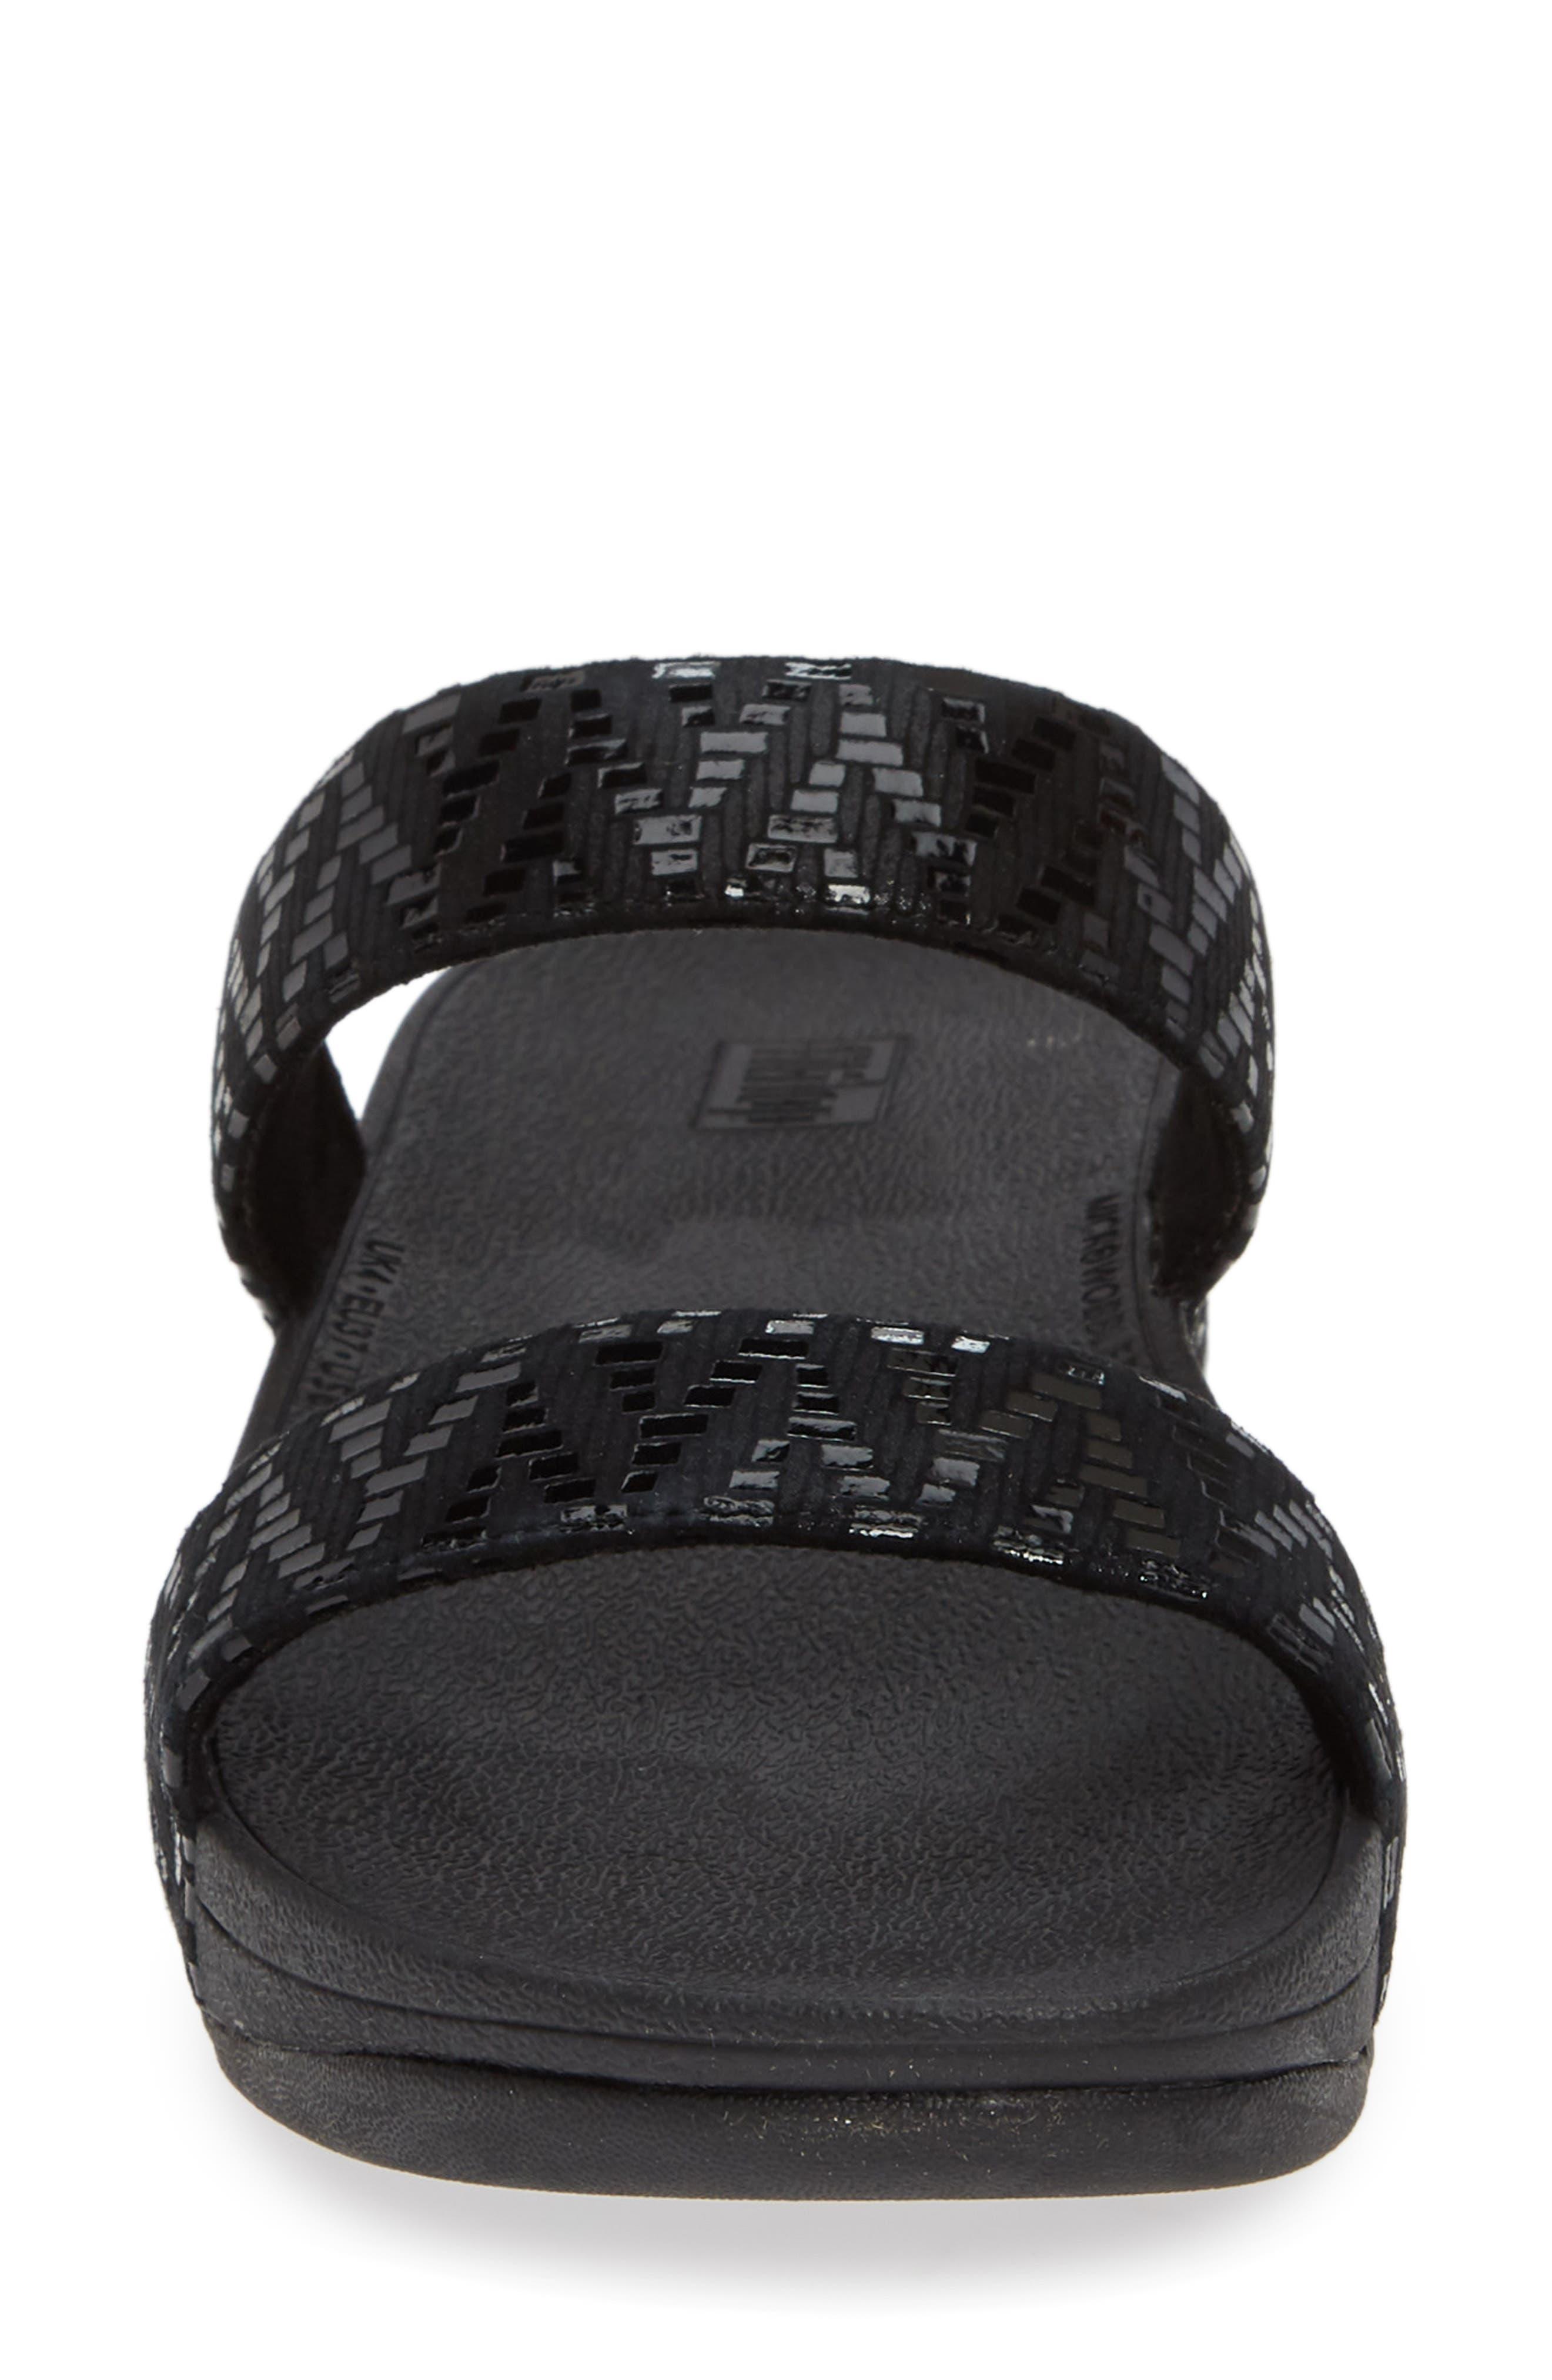 Lottie Chevron Wedge Slide Sandal,                             Alternate thumbnail 4, color,                             BLACK FABRIC